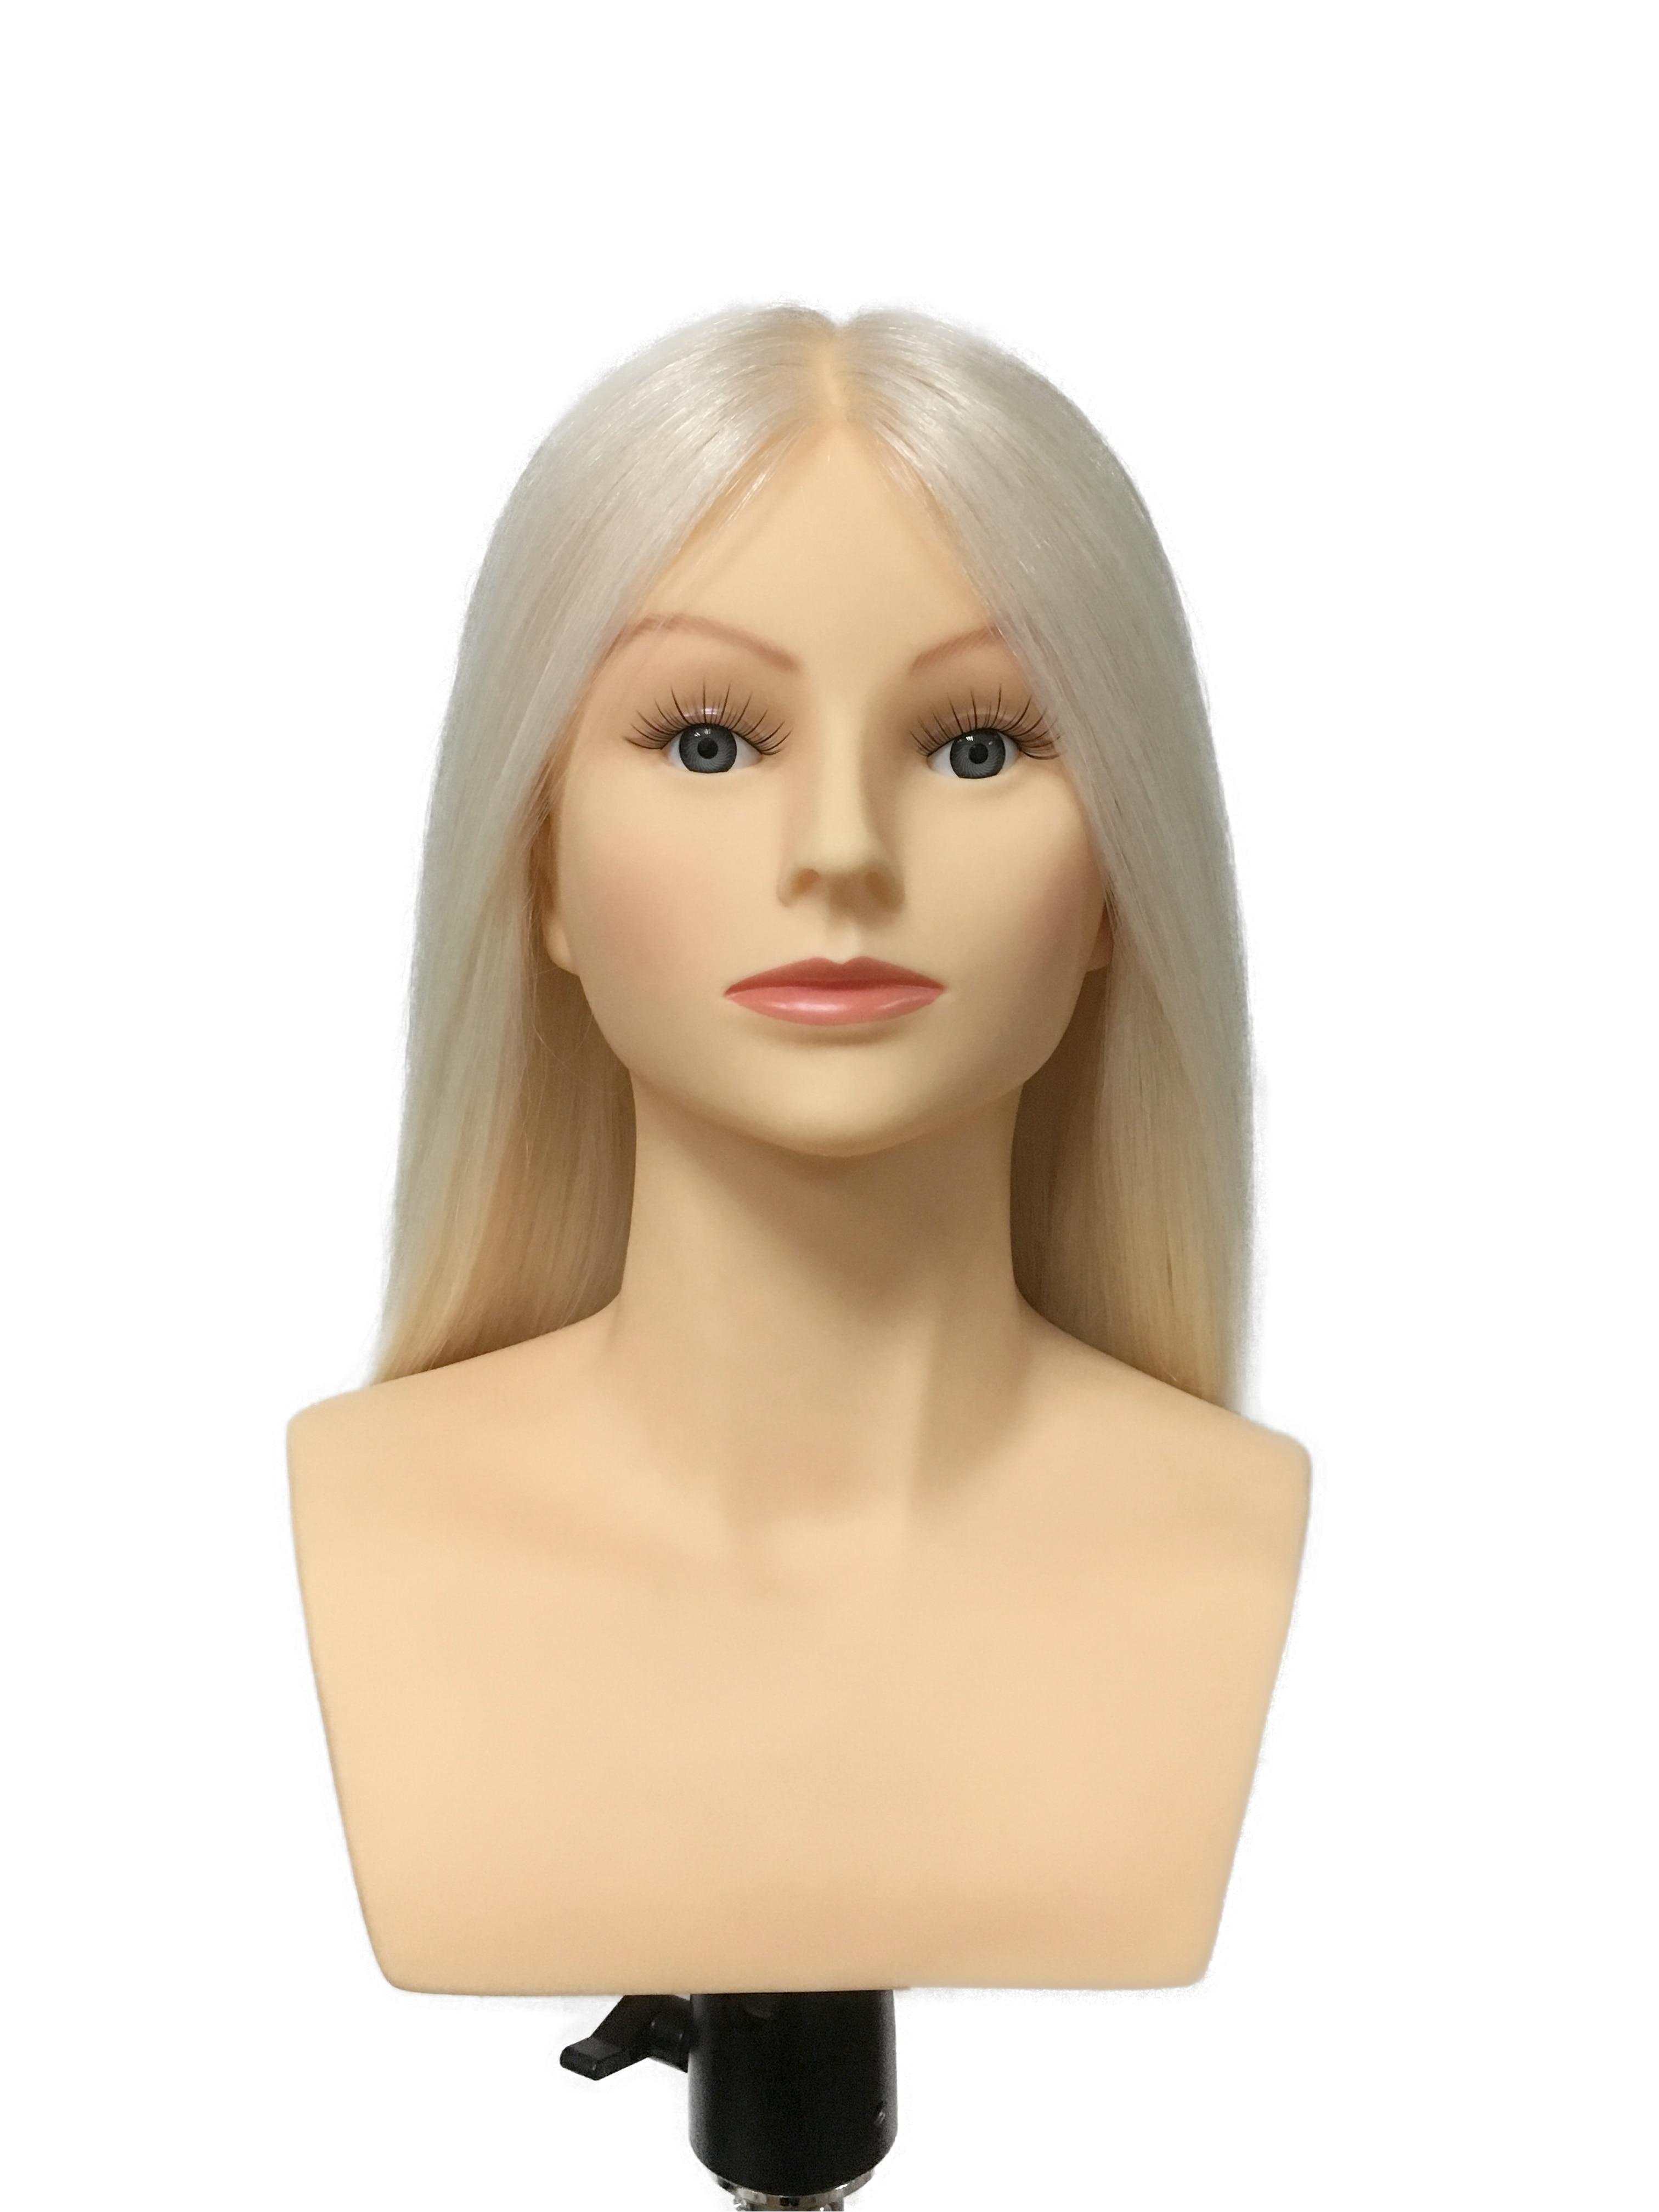 "Prohair omc 승인 40 cm 16 ""100% 화이트 염소 머리 경쟁 마네킹 머리 hairdressing 마네킹 인형 머리 미용사-에서마네킹부터 홈 & 가든 의  그룹 1"